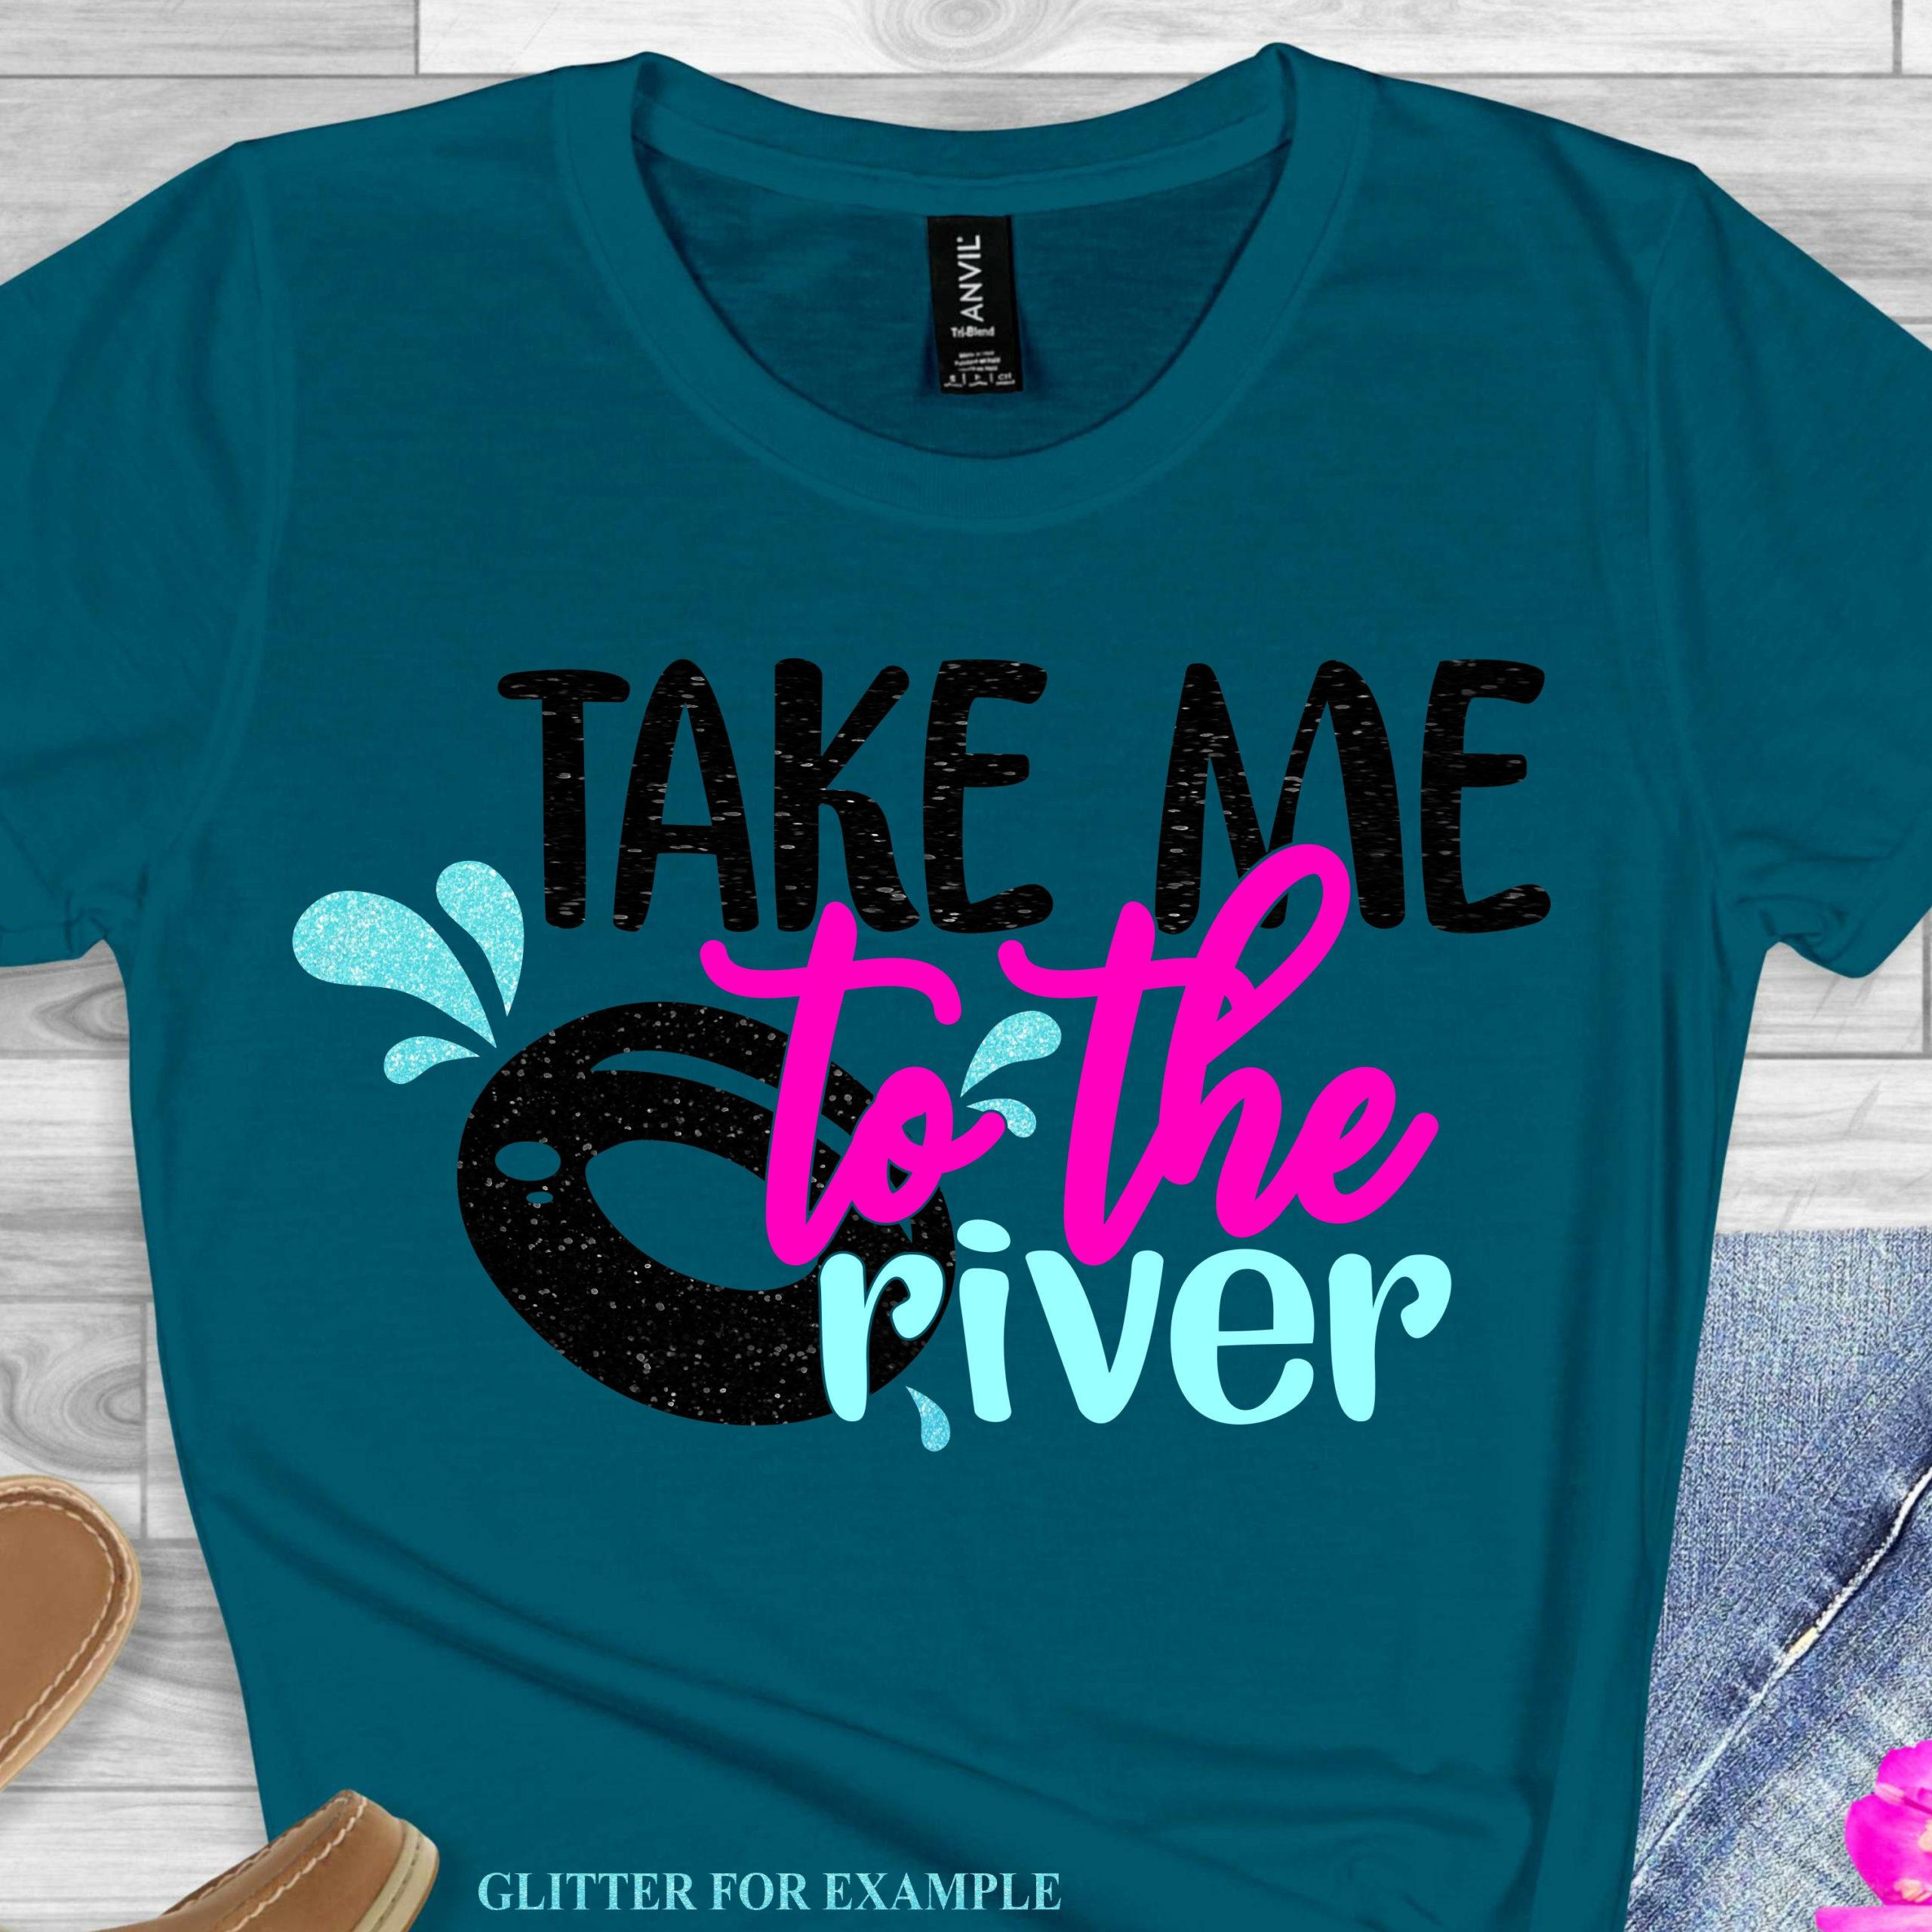 Take-me-to-the-river-svgriver-svg-river-summer-svg-summer-svg-summertime-svgriver-life-svg-beachy-svg-for-cricut-retro-beach-svg-5ef78c2f